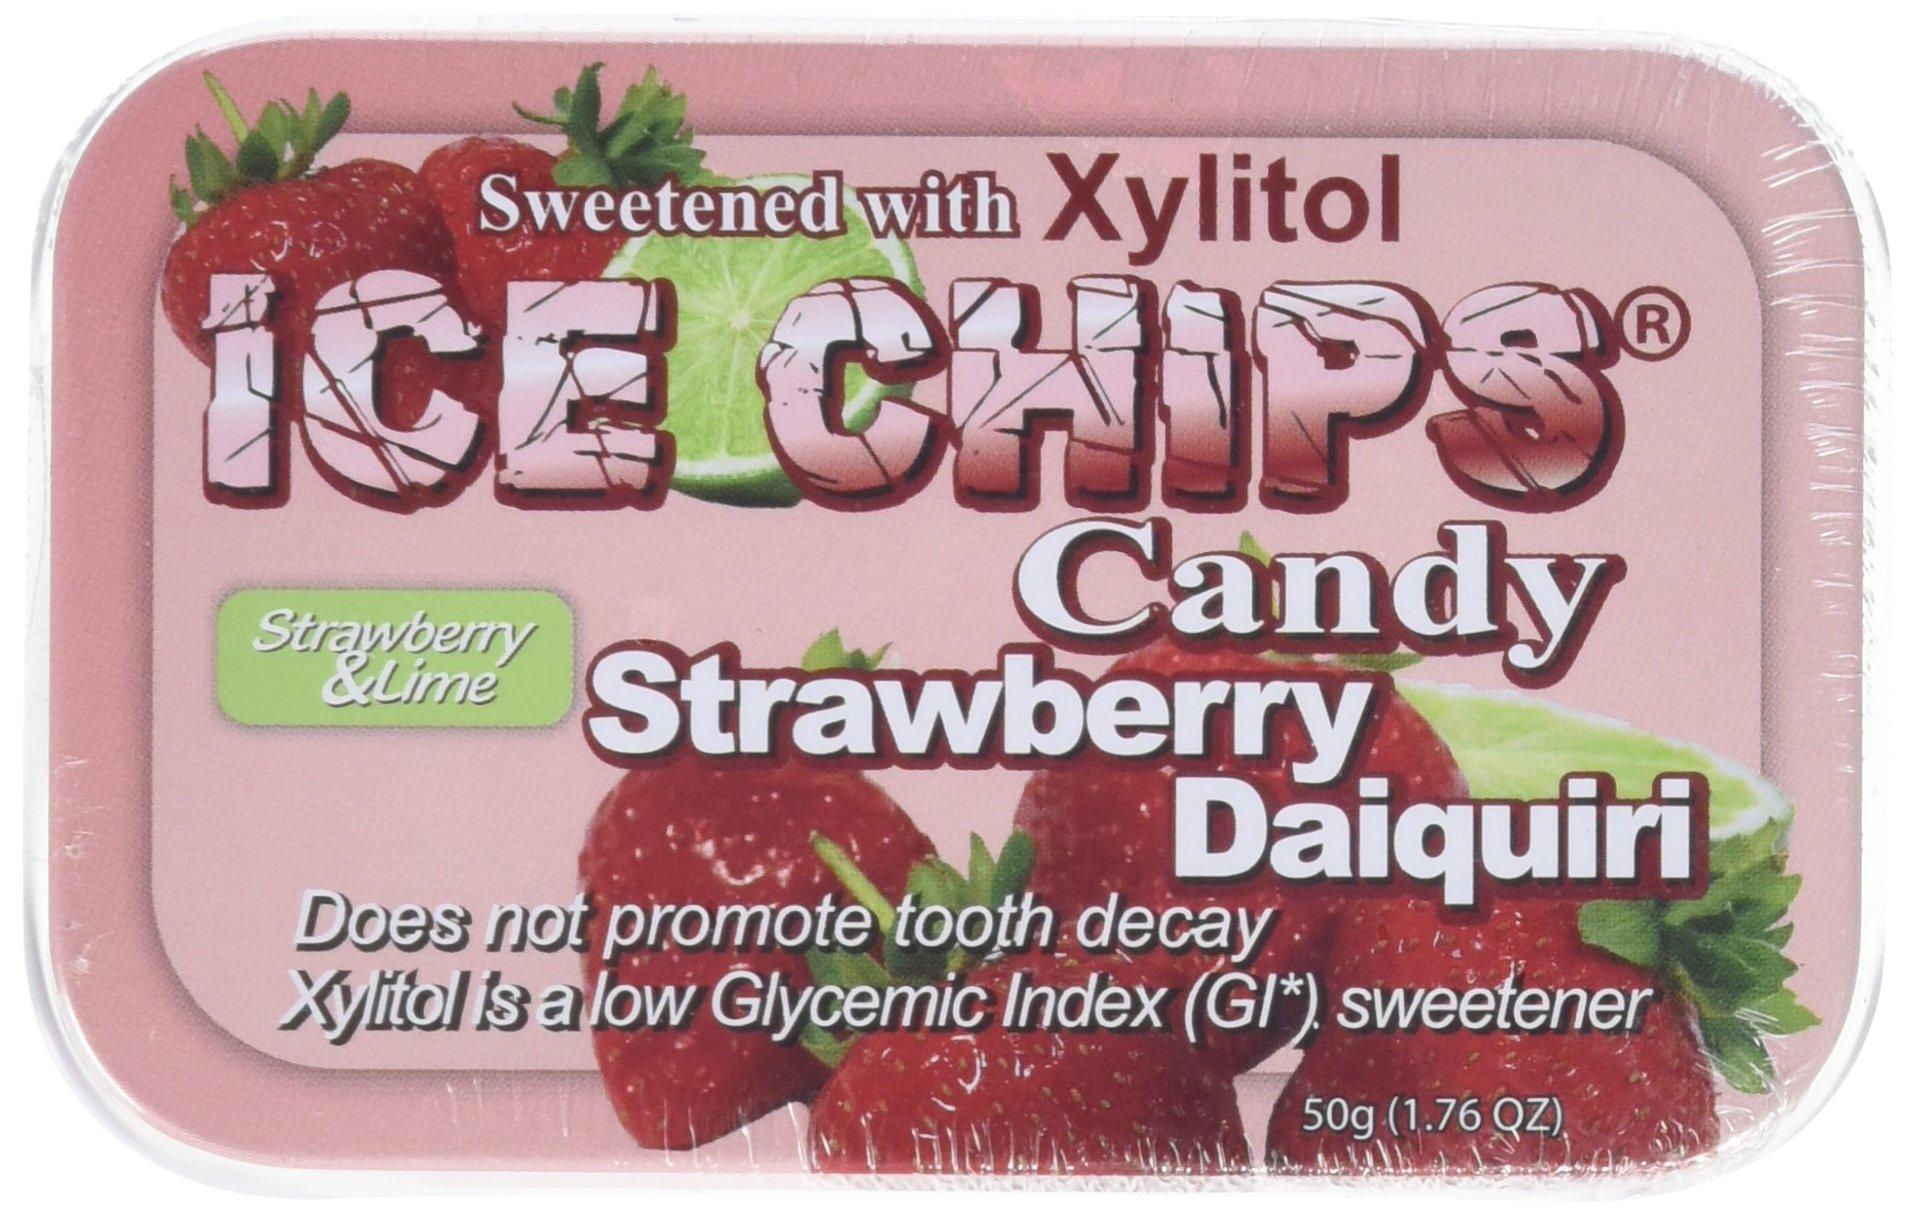 ICE CHIPS Strawberry Daiquiri Xylitol Mints 6 Single Tins